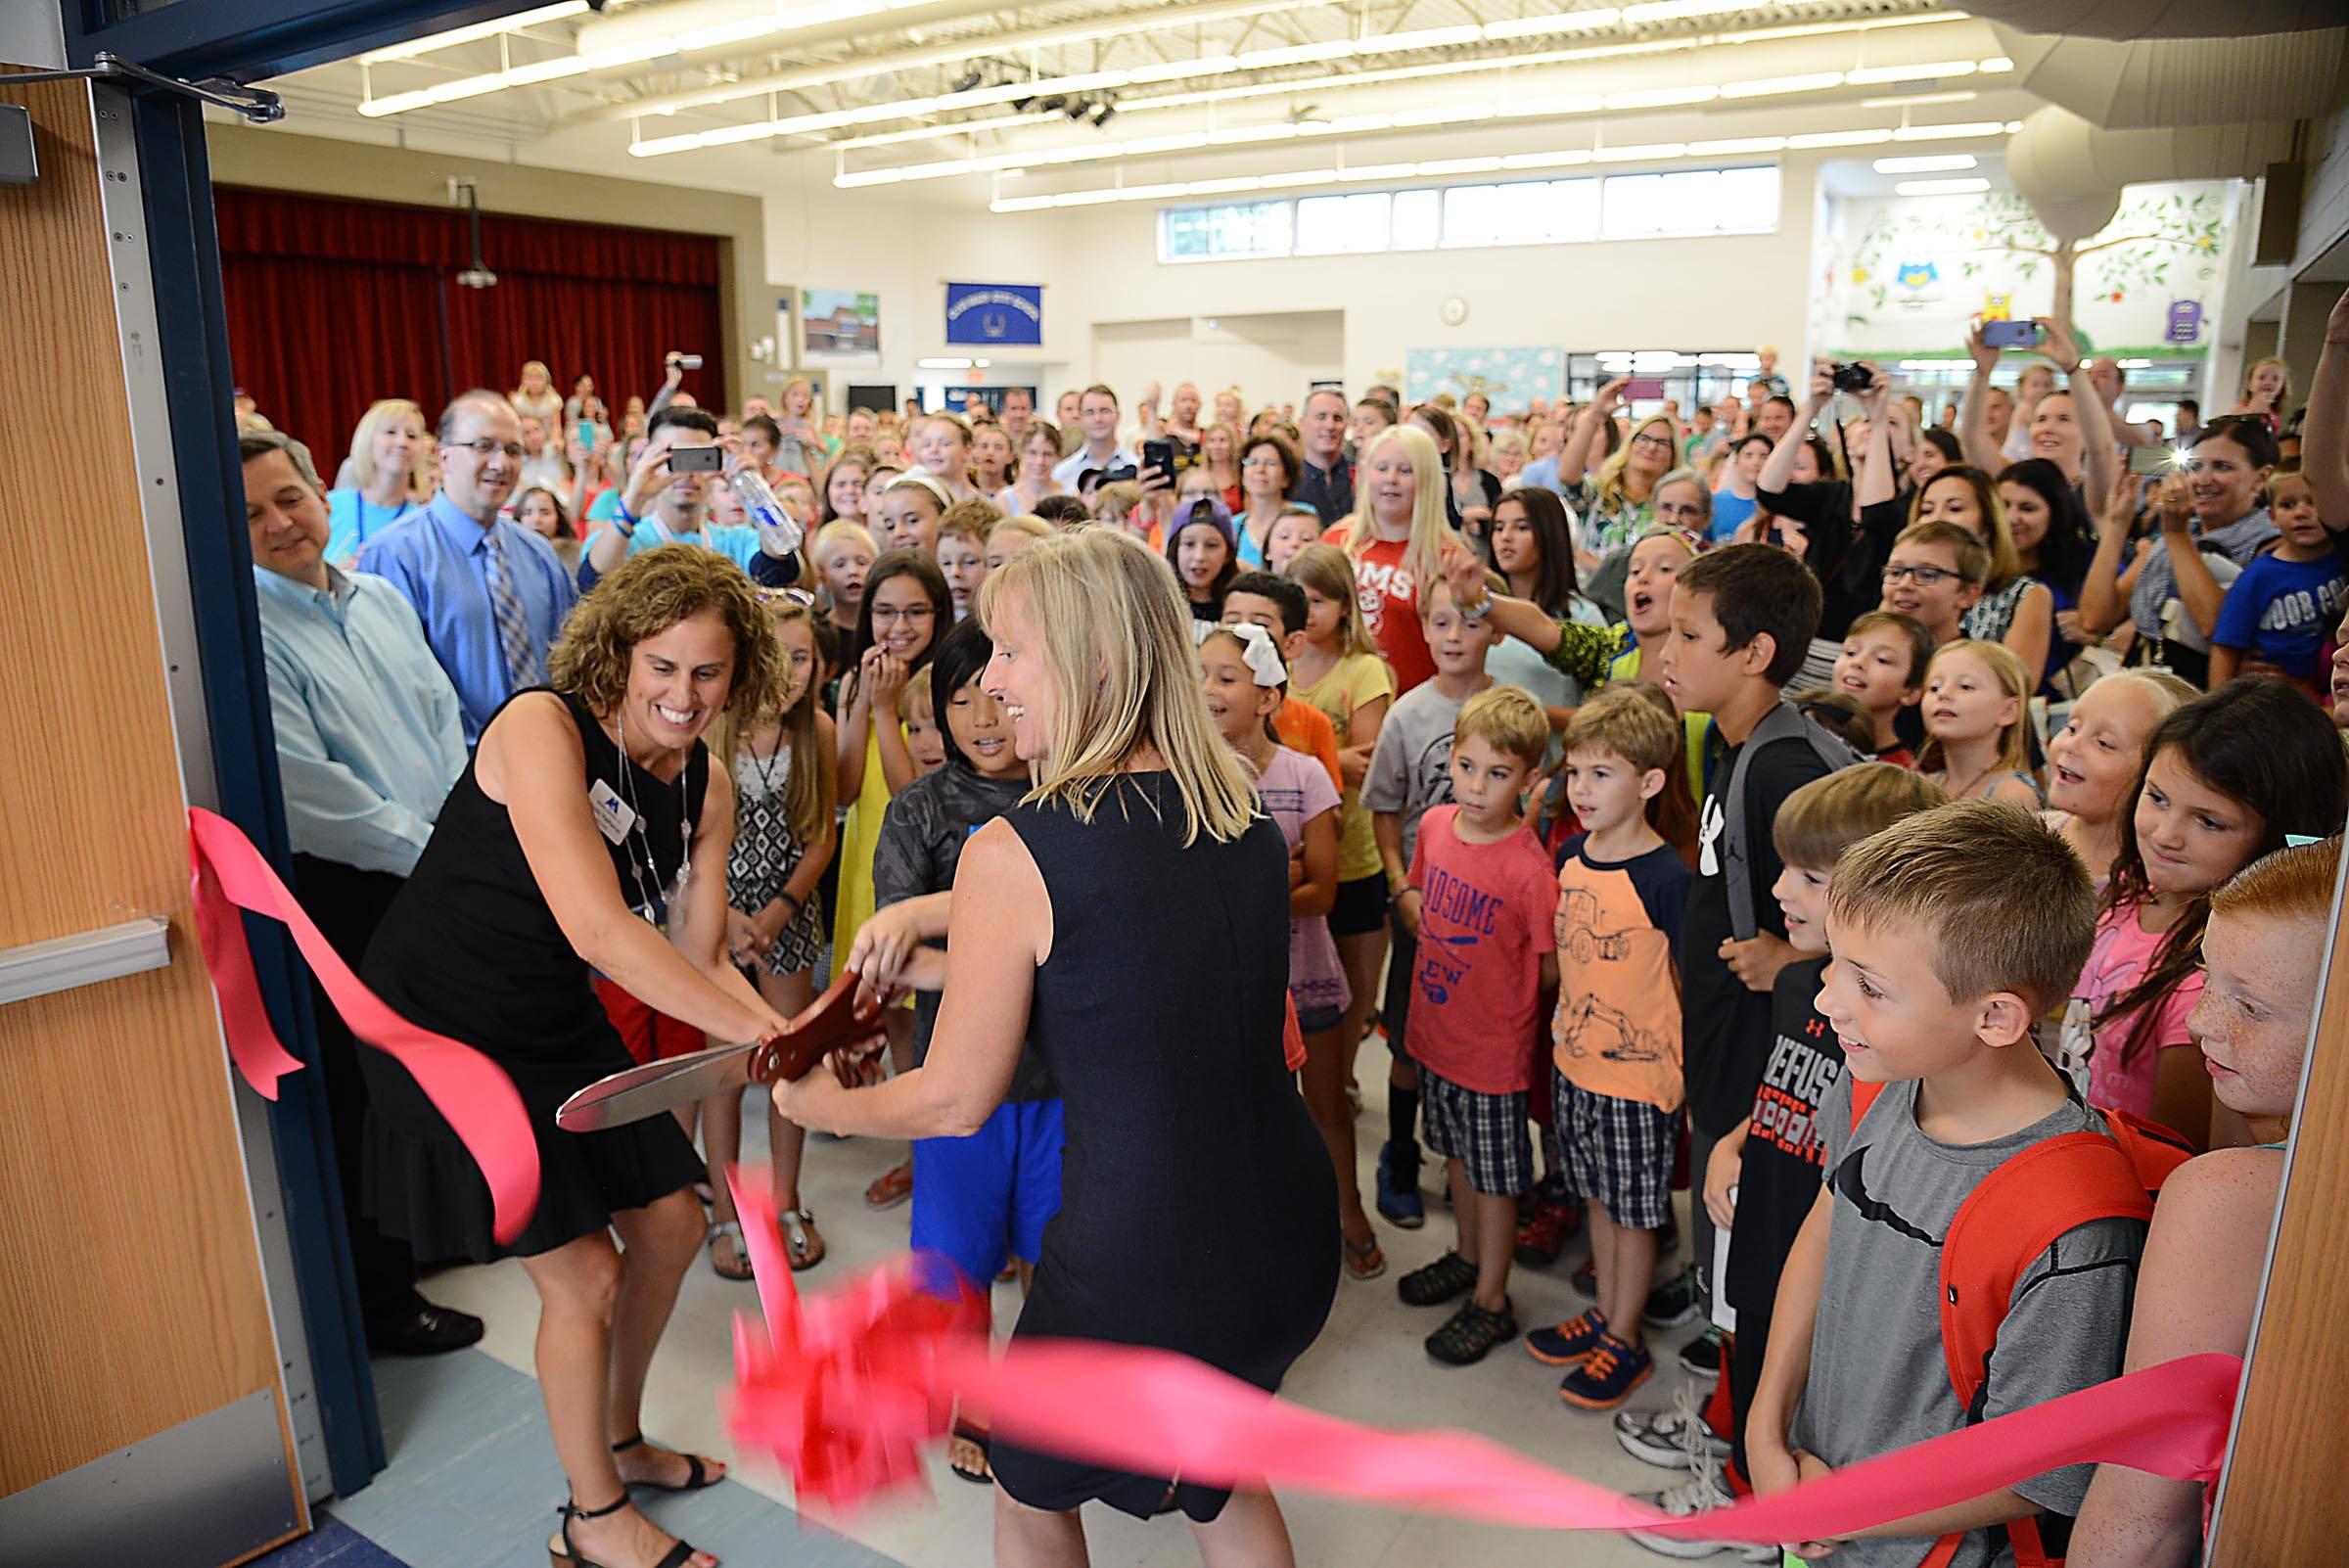 Dist. 25 debuts $18 million renovations at Ivy Hill, Olive schools